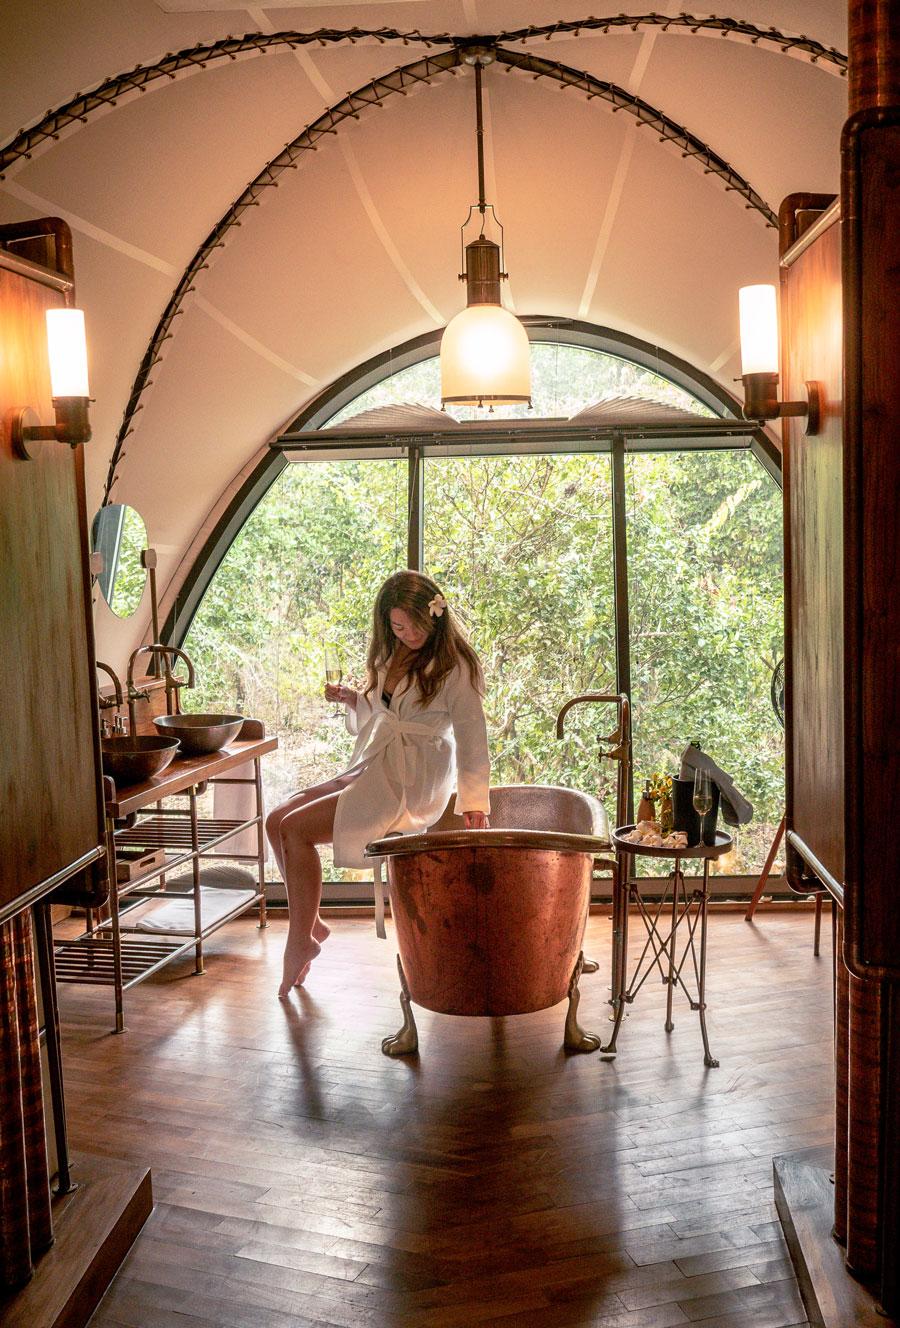 Copper Bath Tub Wild Coast Tented Lodge Sri Lanka Yala